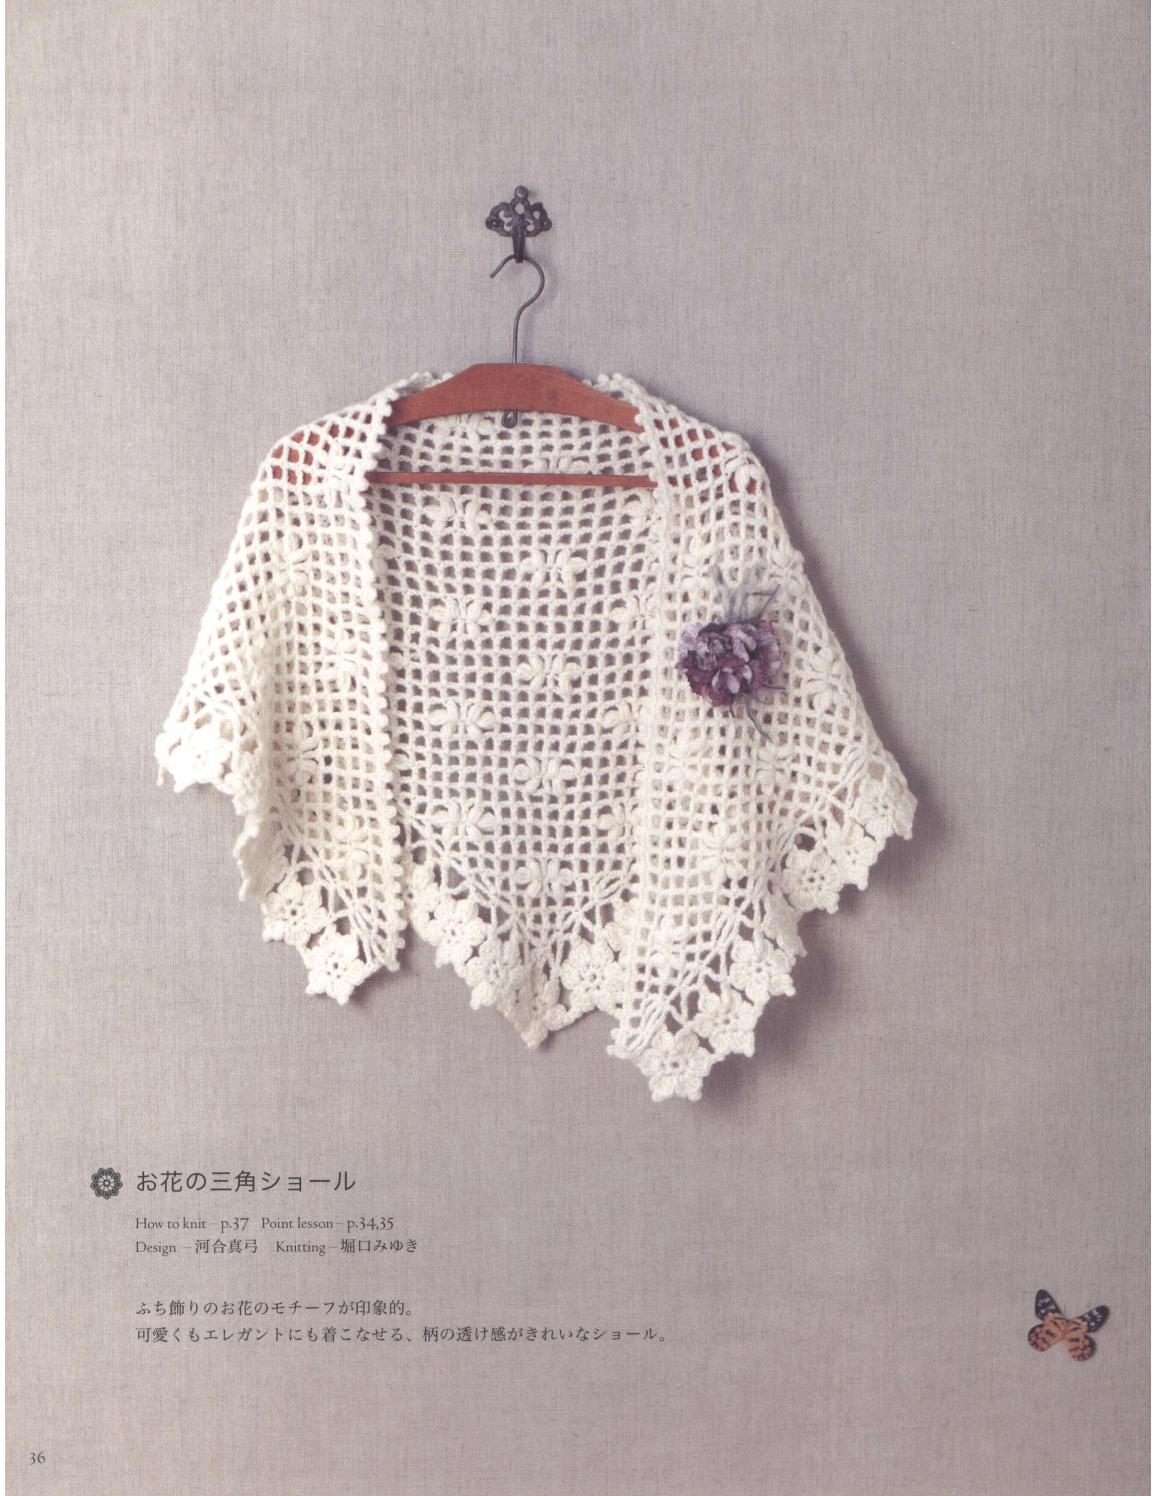 Asahi original crochet best selection 2012 page 36